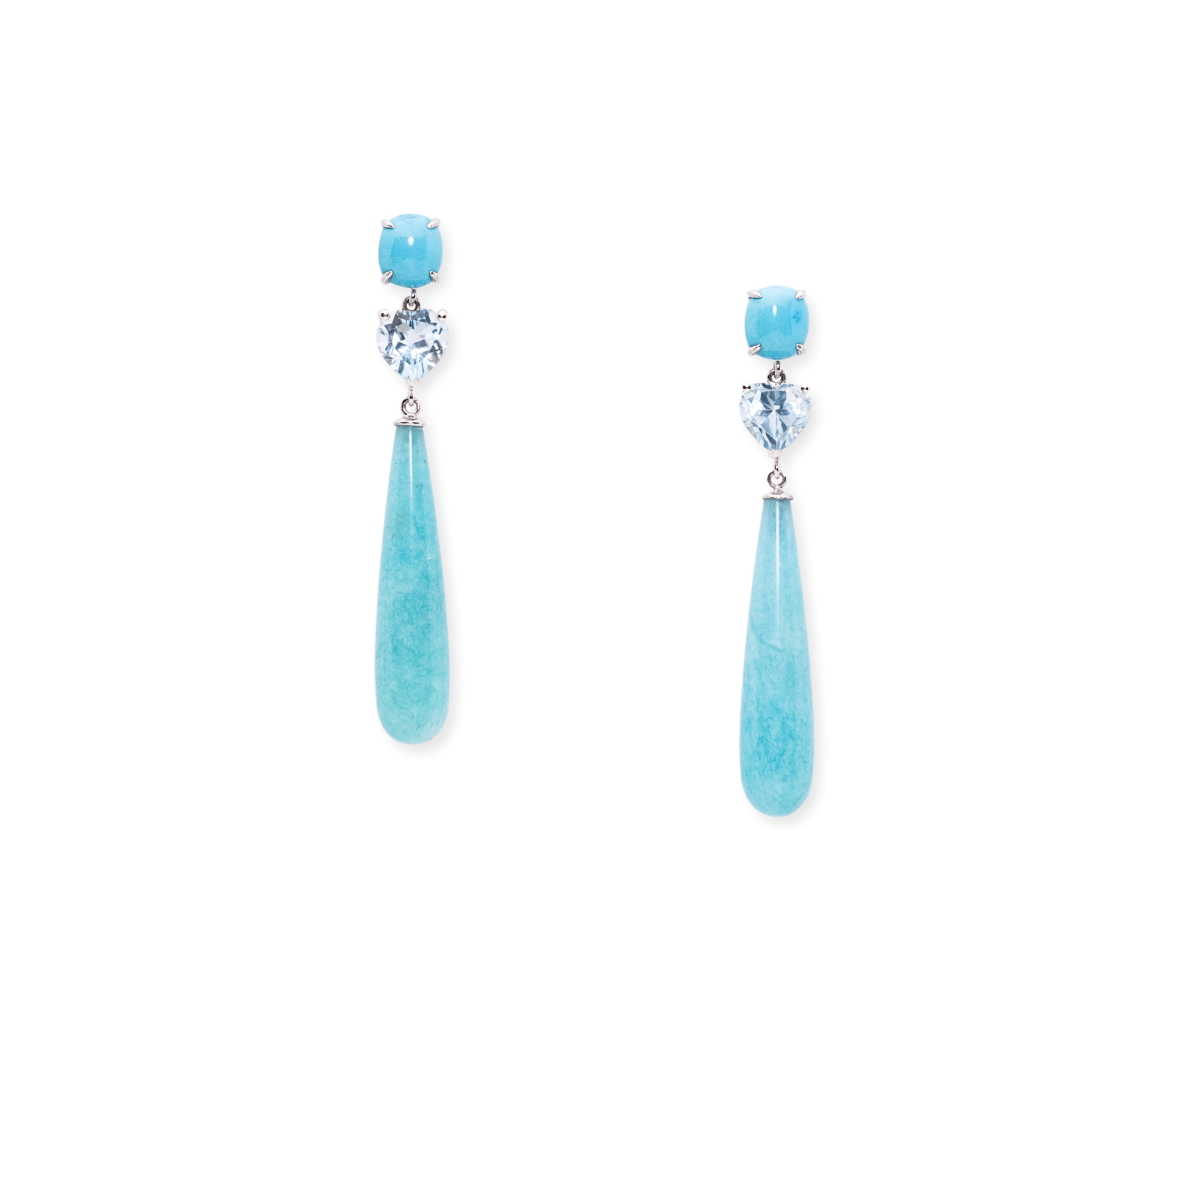 Sleeping Beauty turquoise fo¡rom Arizona, USA, heart shape aquamarines from Madagascar and long tear drop amazonites from Brazil se in 18kts white gold earrings (1).JPG